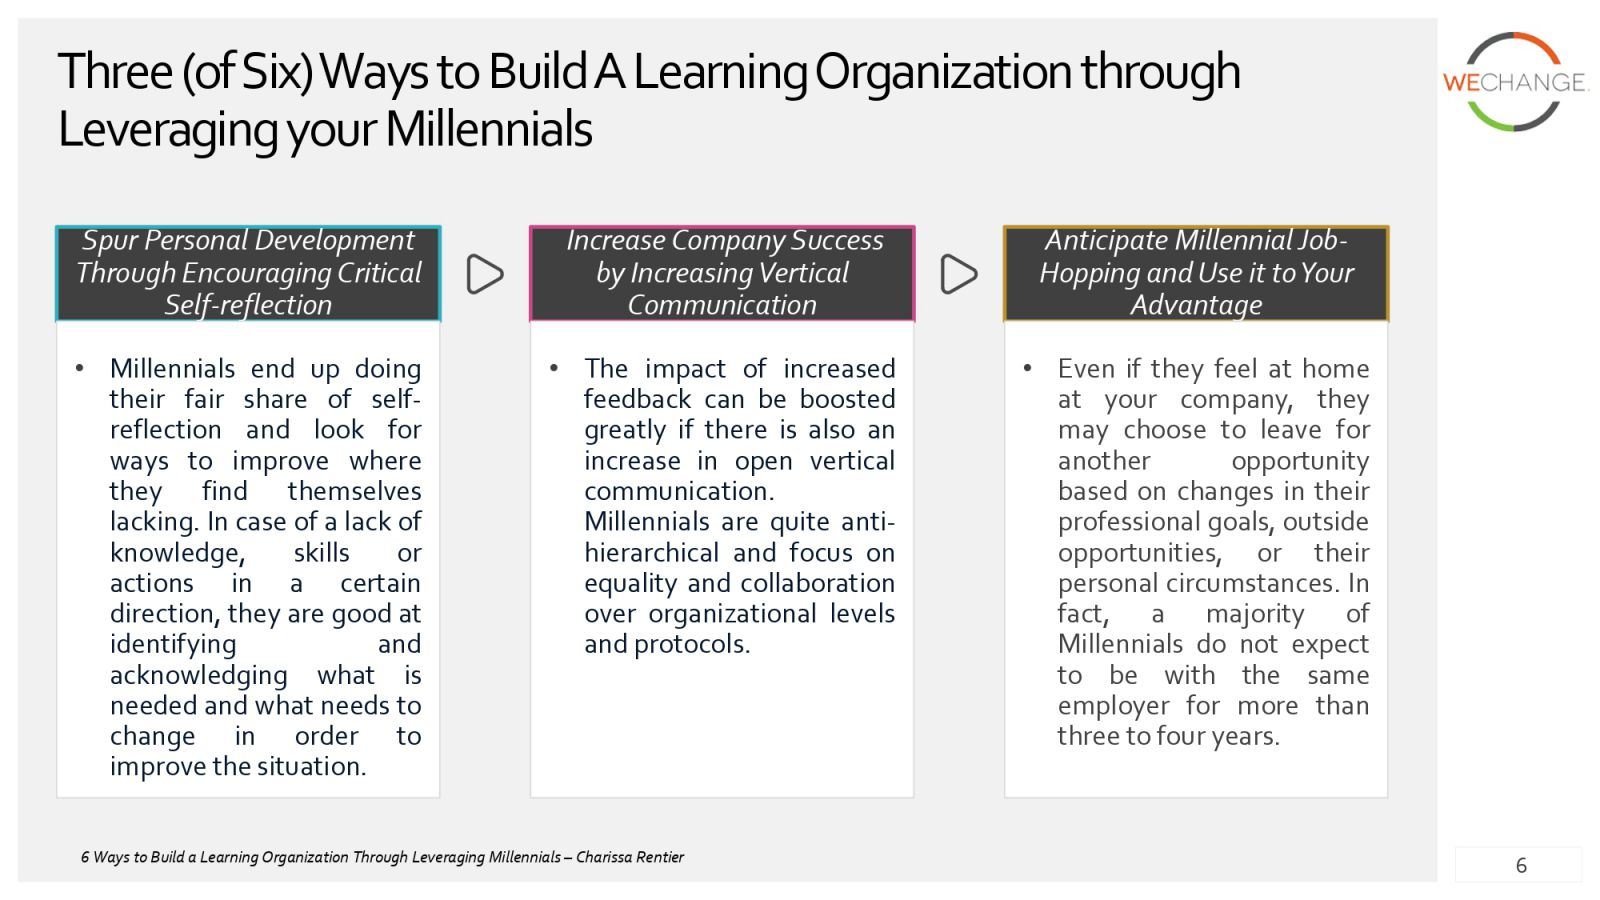 learnin organization in practice page 0006 compressed The learning organization in practice